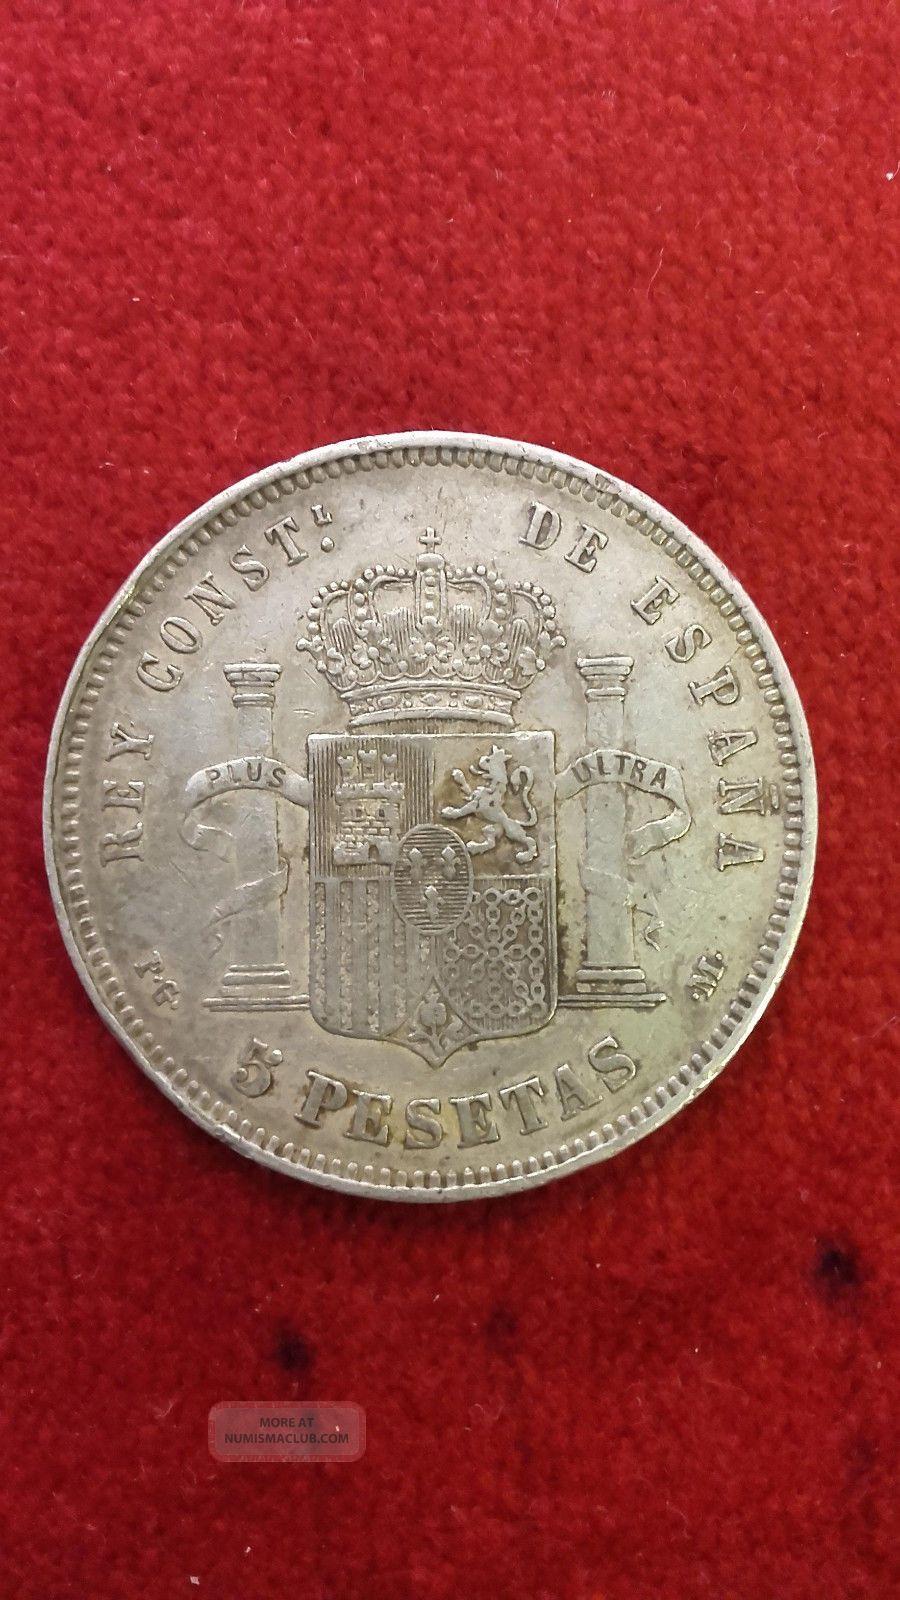 Spain : Silver 5 Pesetas 1891.  Alfonso Xiii.  Grade Vf. Spain photo